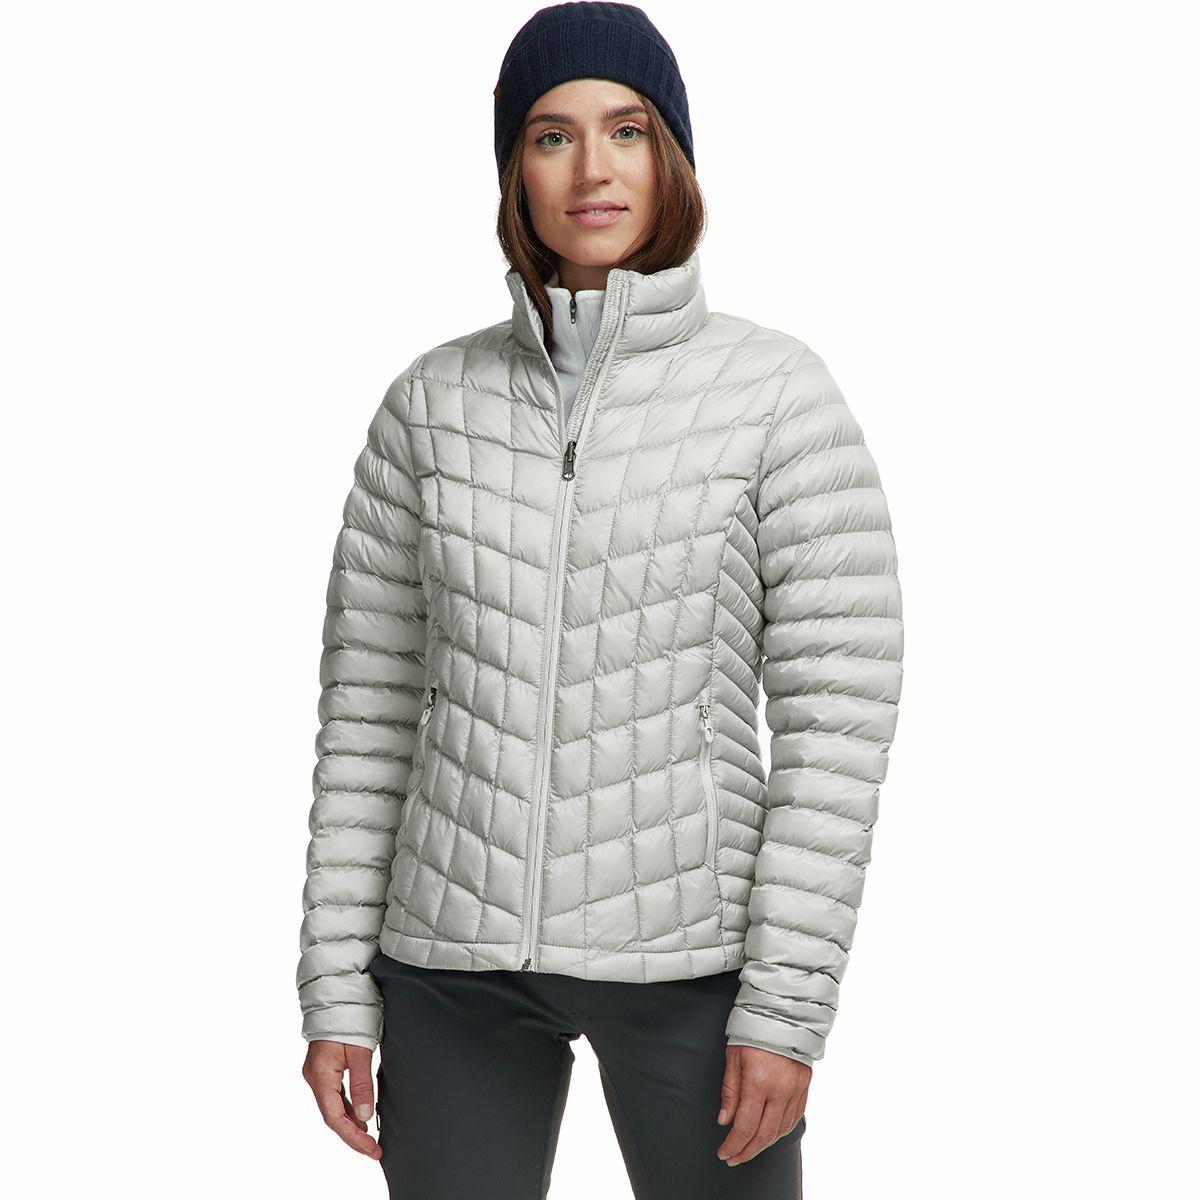 Featherless Insulated Jacket - Women